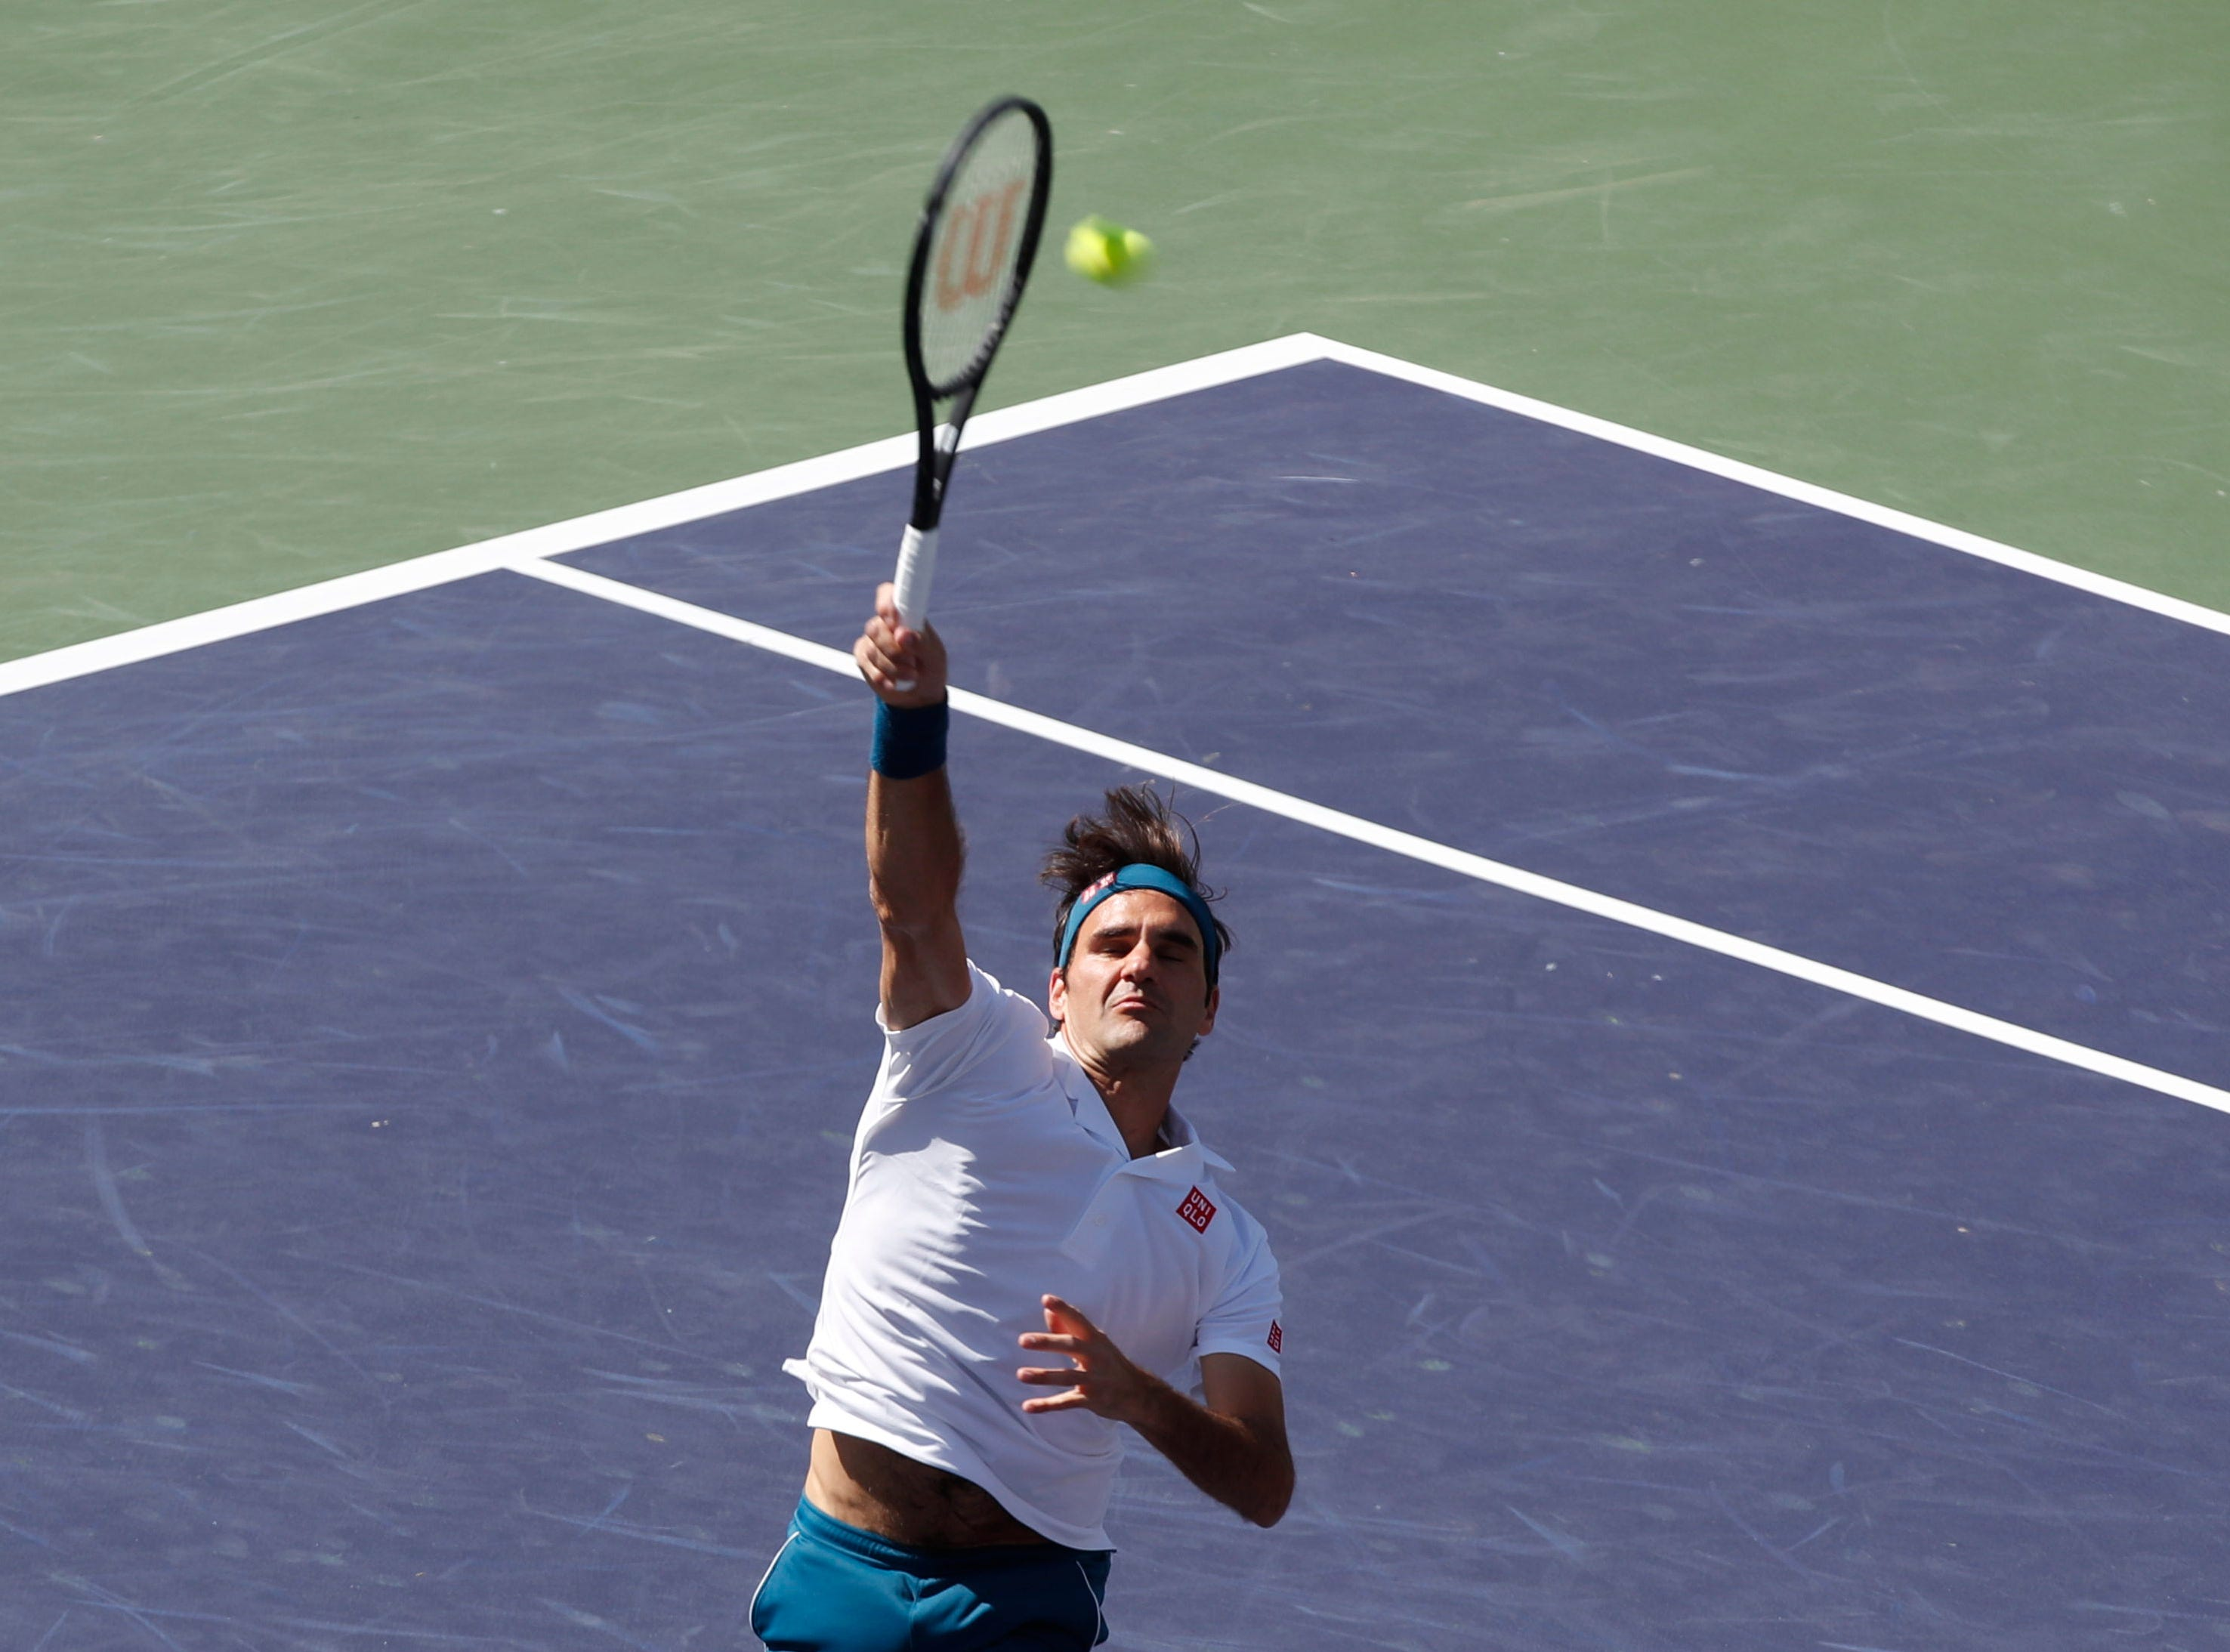 Roger Federer approaches the net during his quarterfinal match against Hubert Hurkacz on Stadium One at the 2019 BNP Paribas Open at Indian Wells Tennis Garden on March 15, 2019. Federer won 6-4, 6-4.